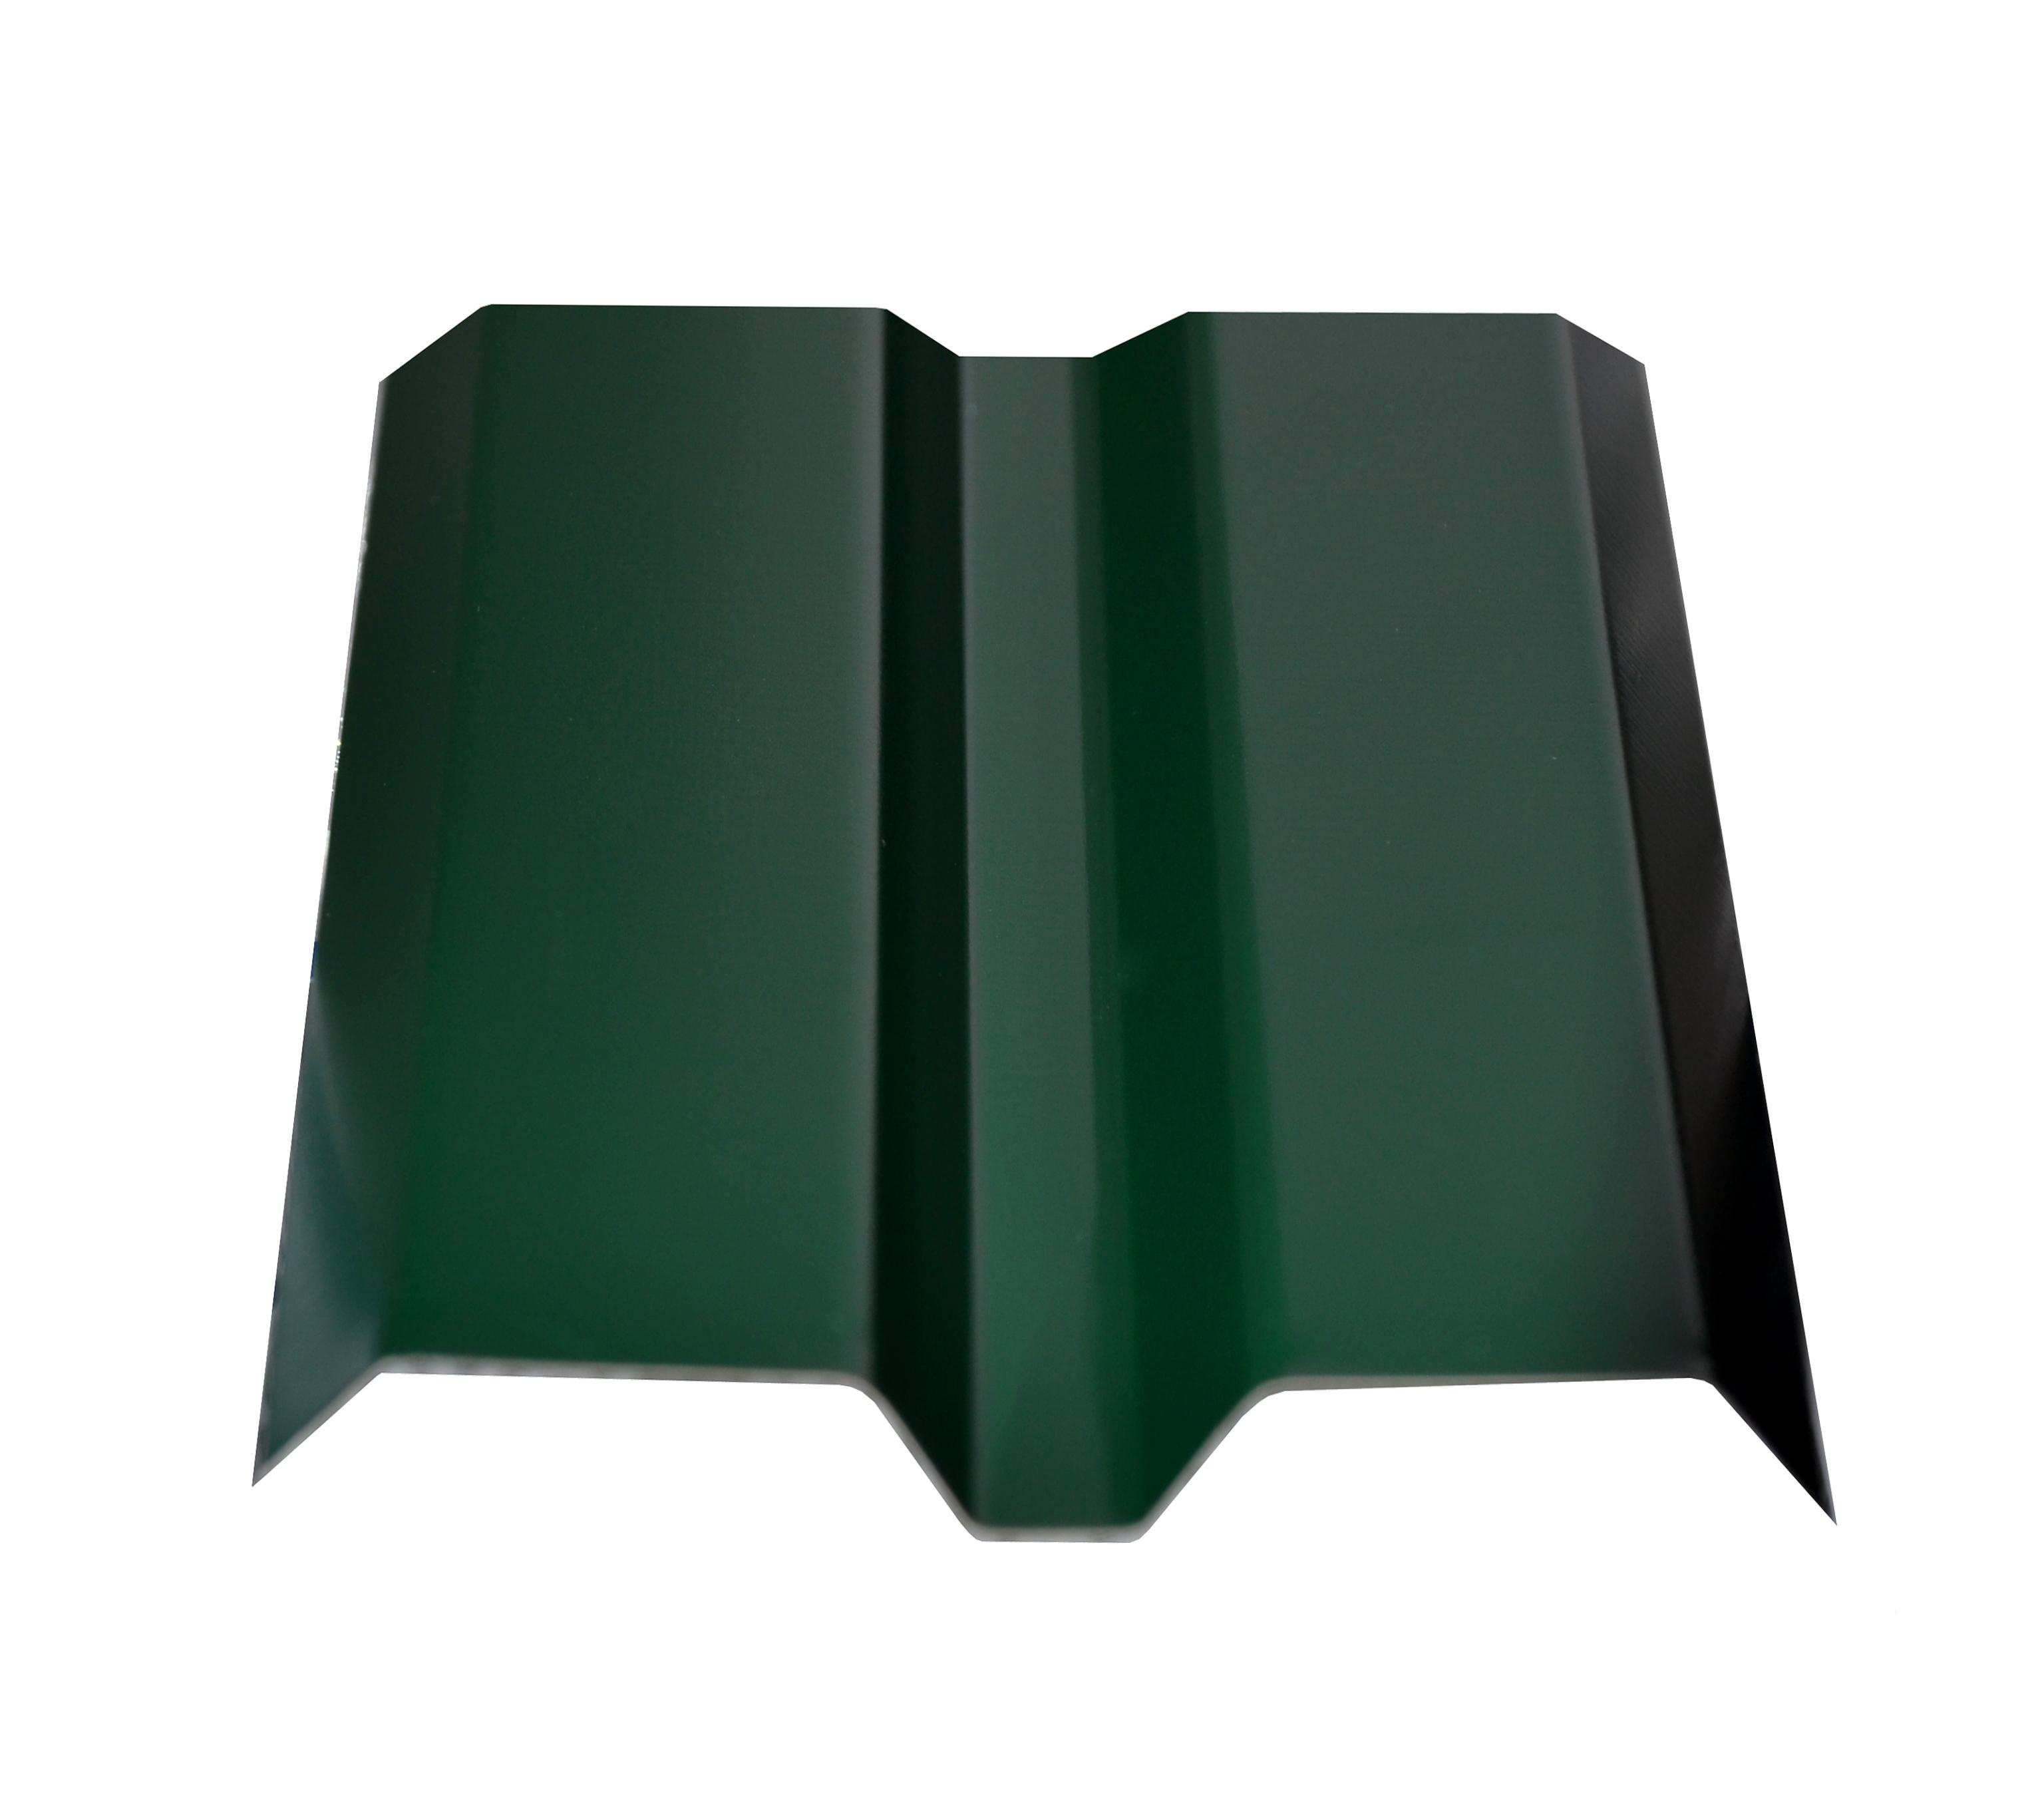 Евроштакетник  87х2000мм, толщина 0,4 мм зеленый